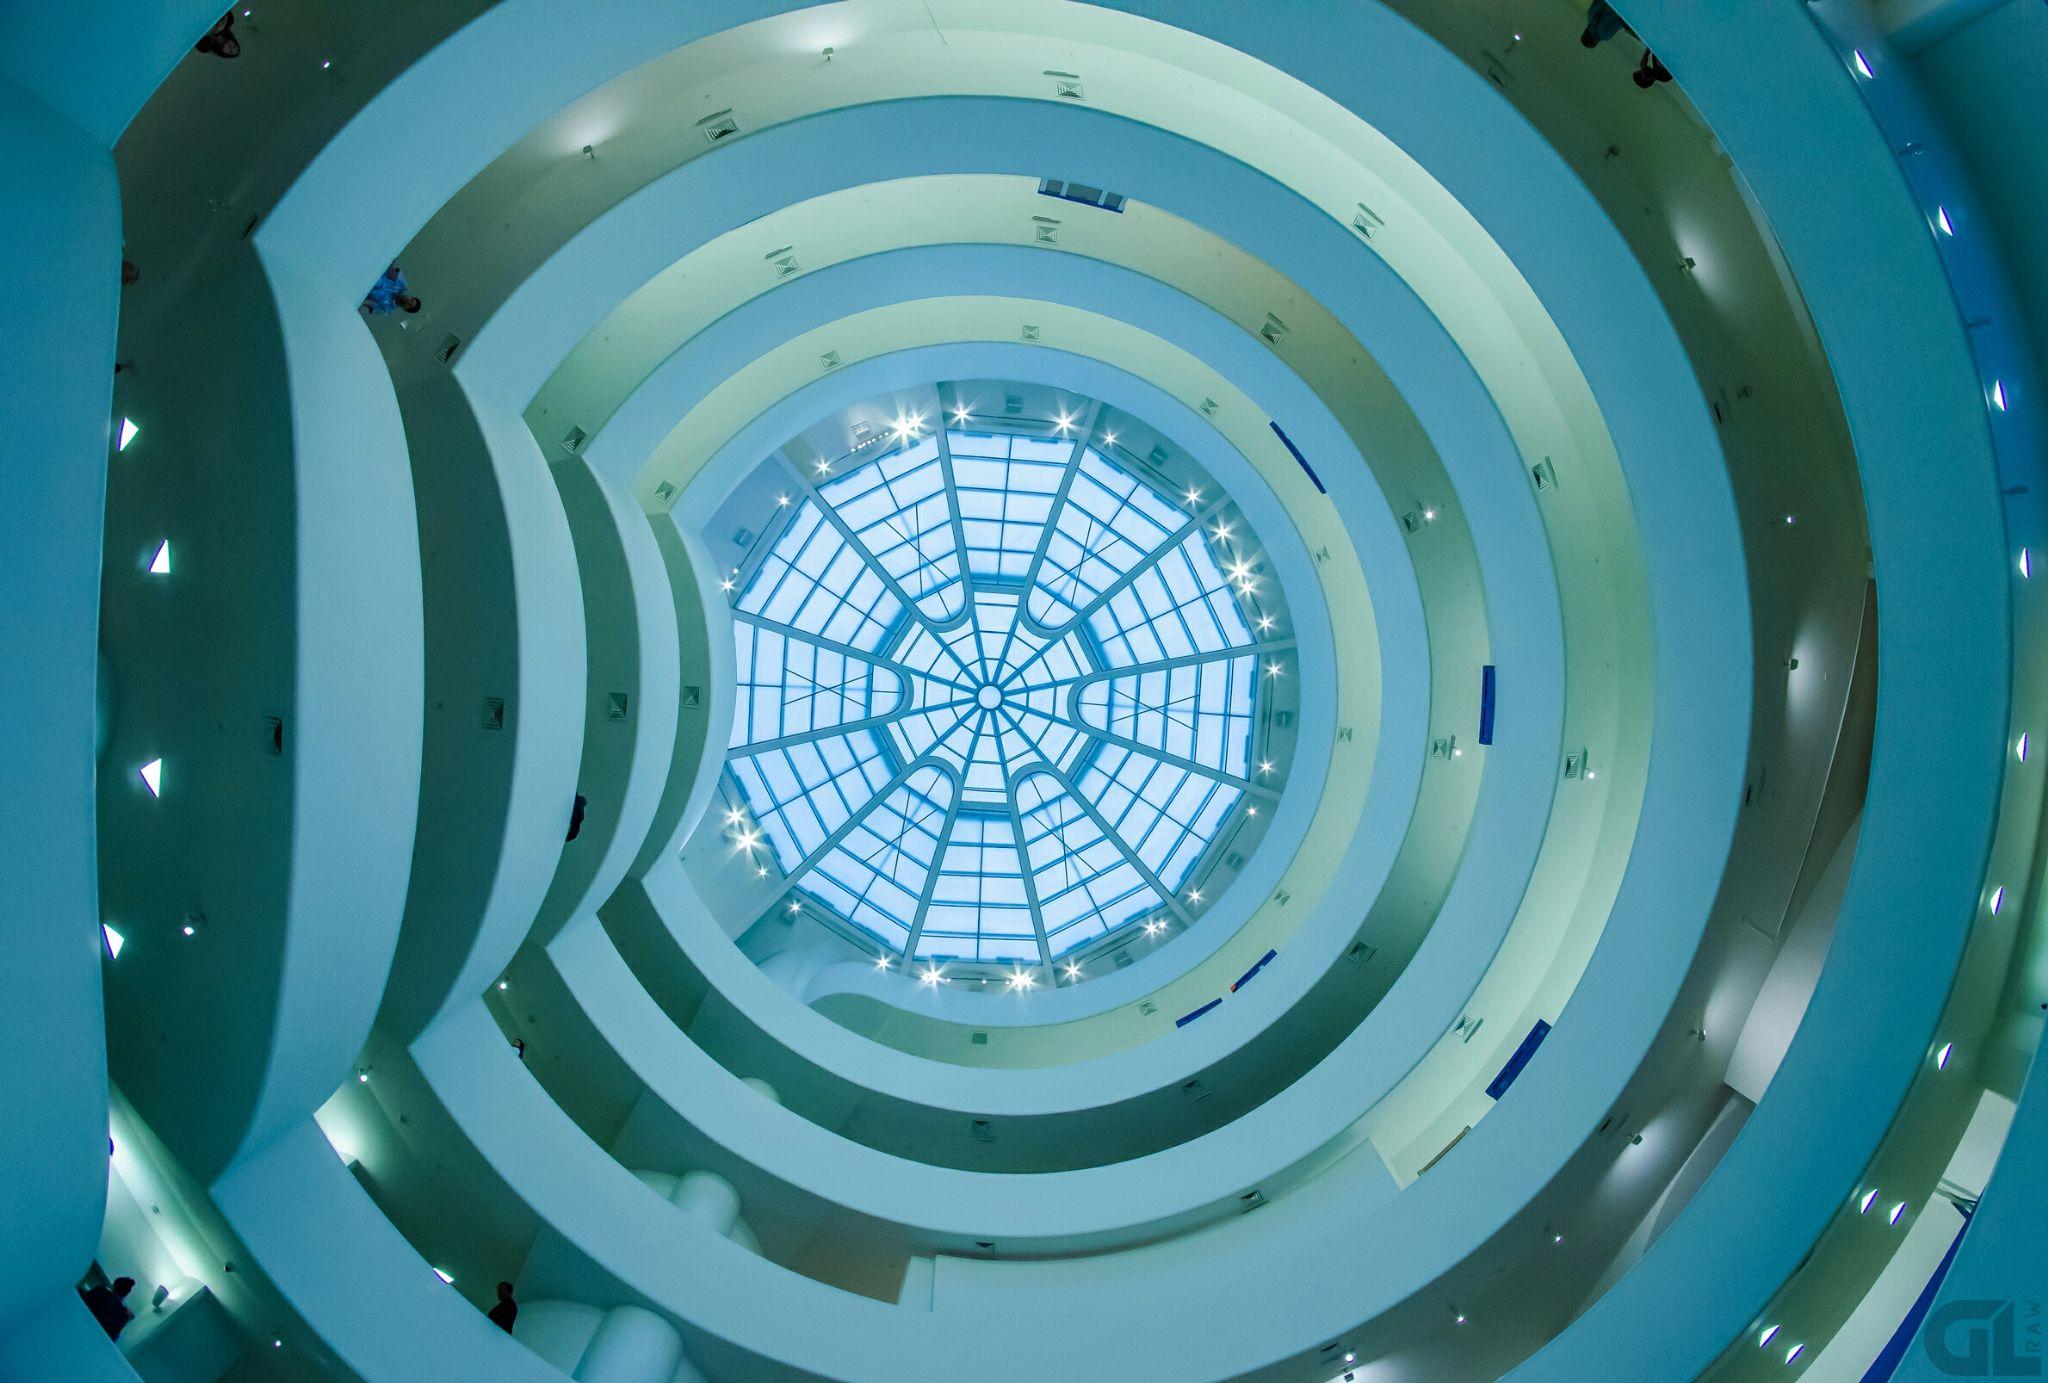 New York Solomon R. Guggenheim Museum by GL Photography